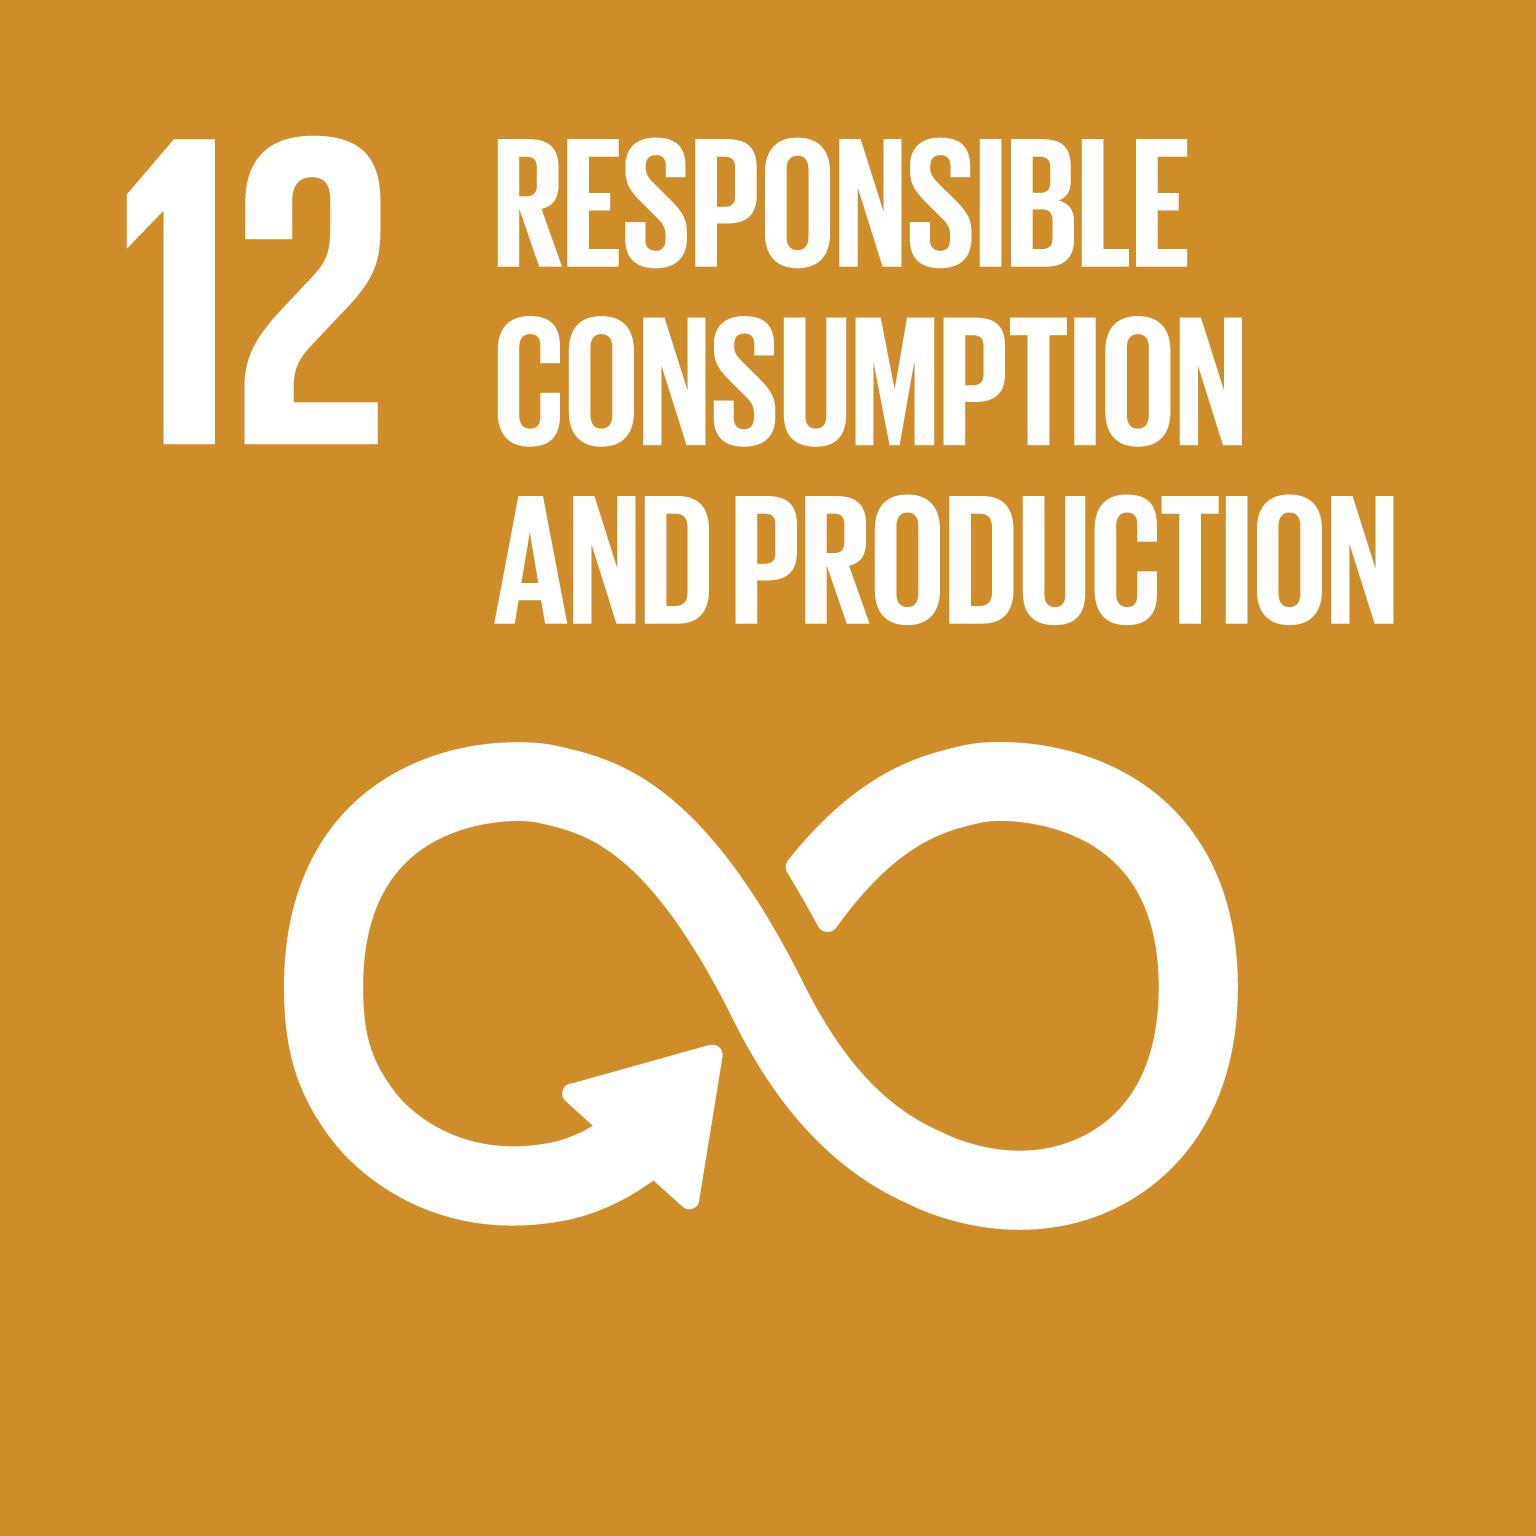 Goal 12 - Responsible Consumption & Production